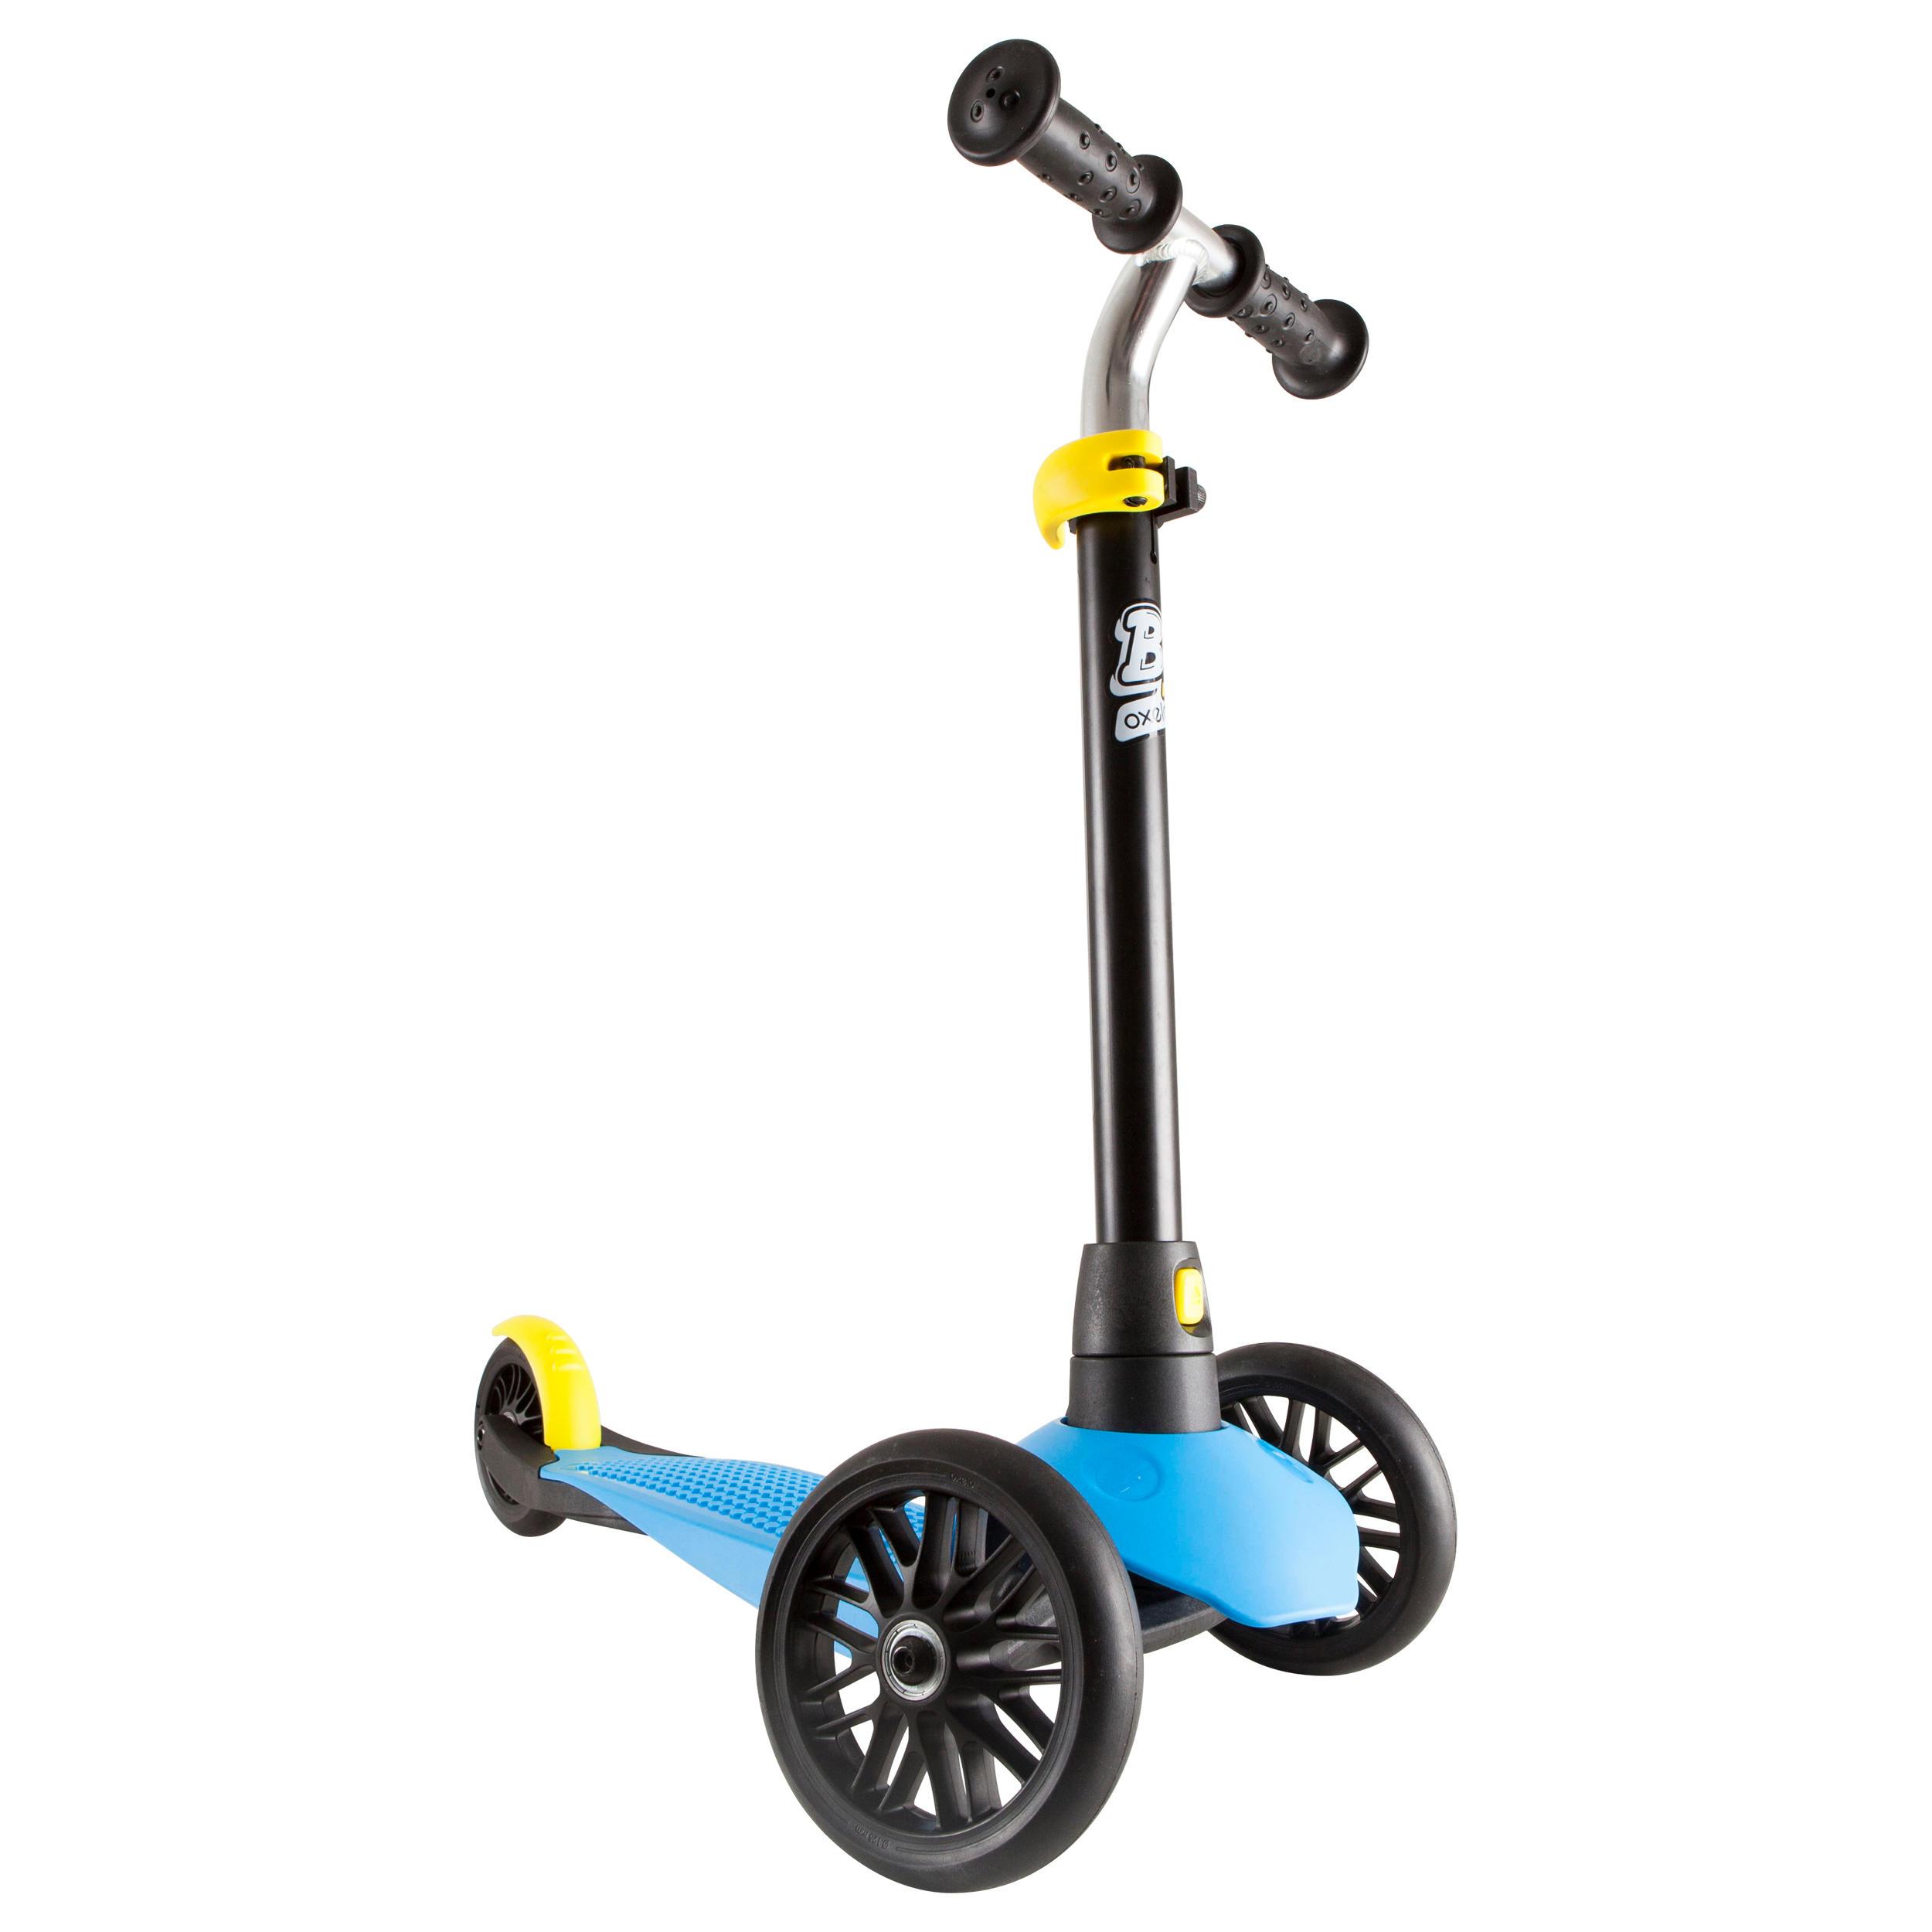 B1 Kids' Scooter Frame